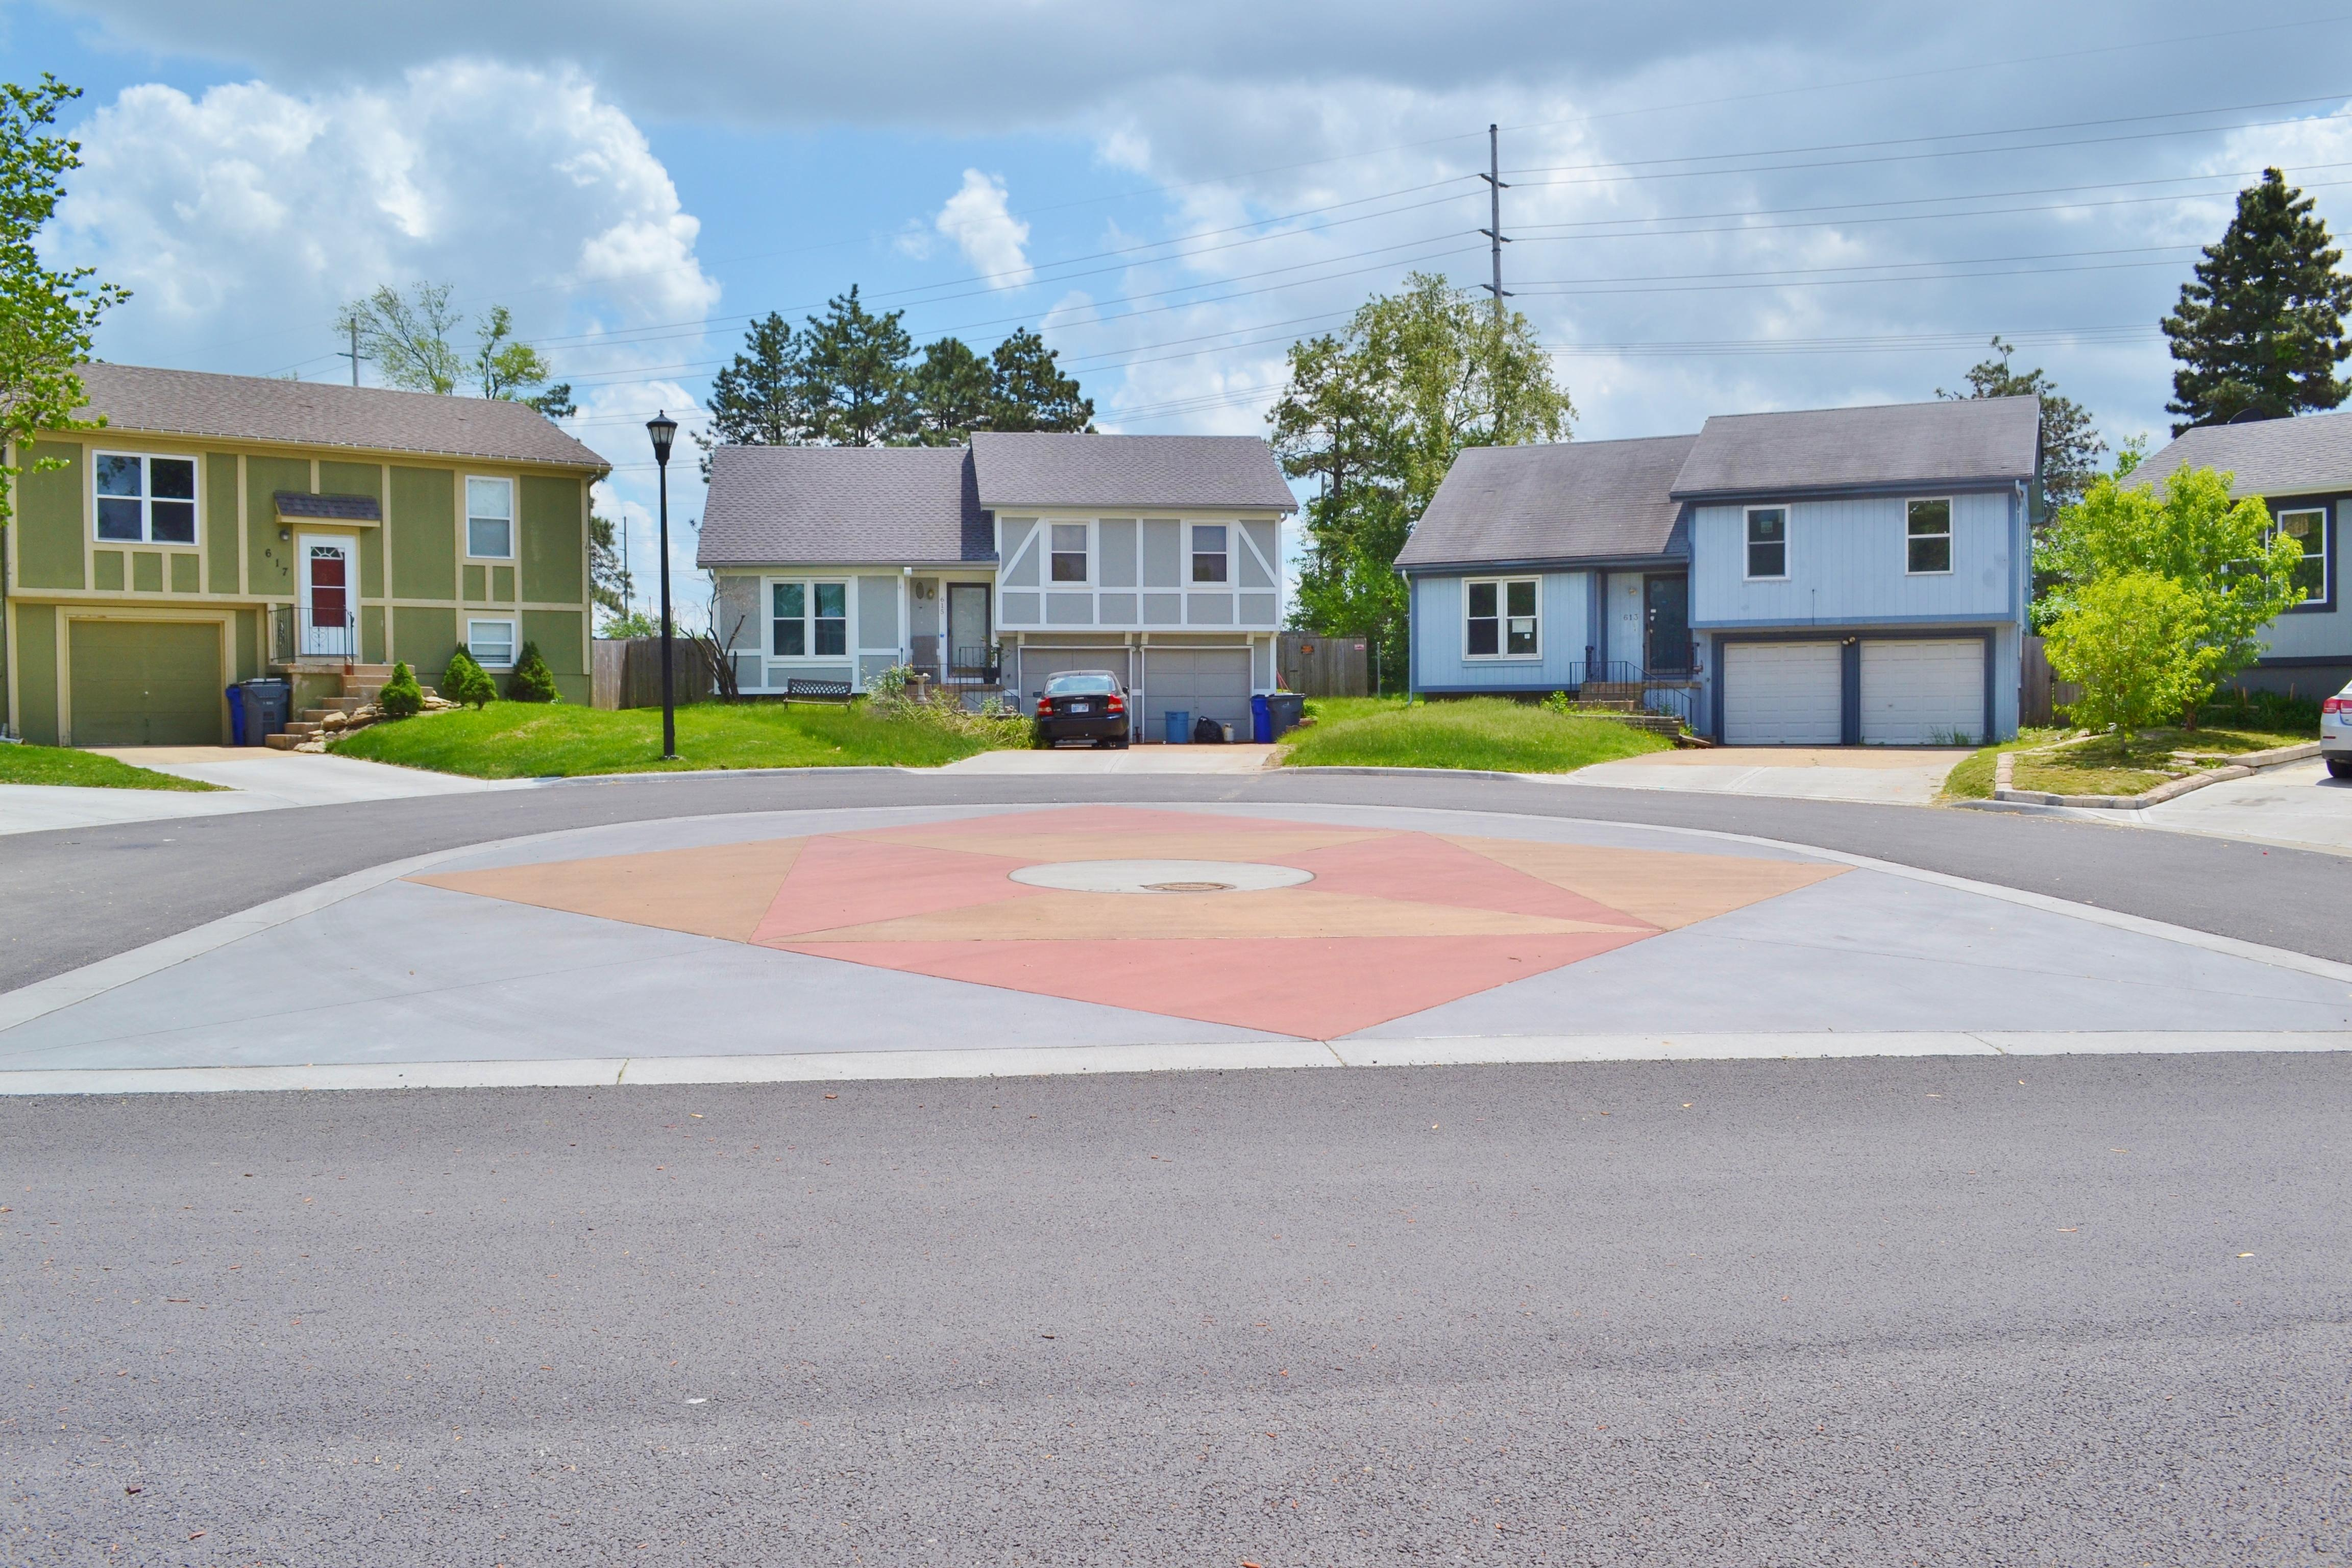 Lakehurst Neighborhood Street Improvements